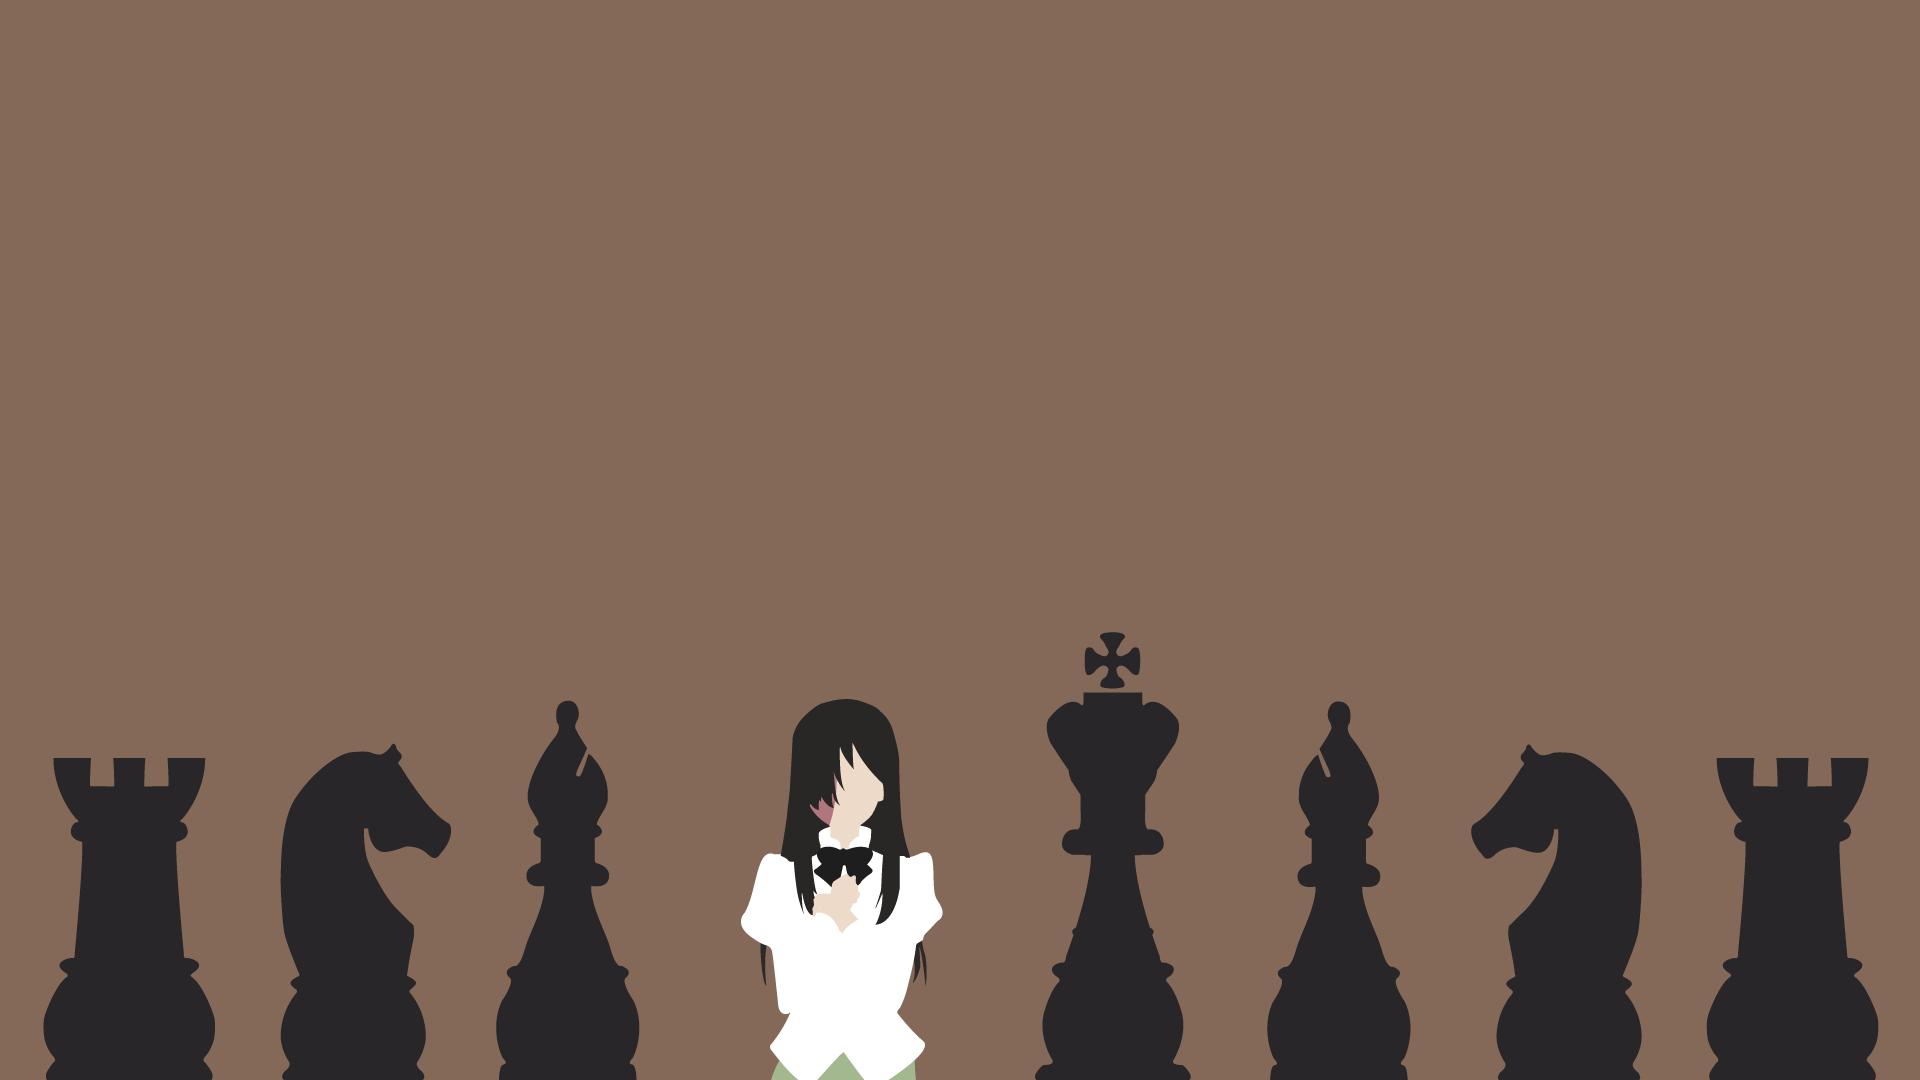 Hanako chess minimalist vector wallpaper by mikeandike020 for Minimal art vector